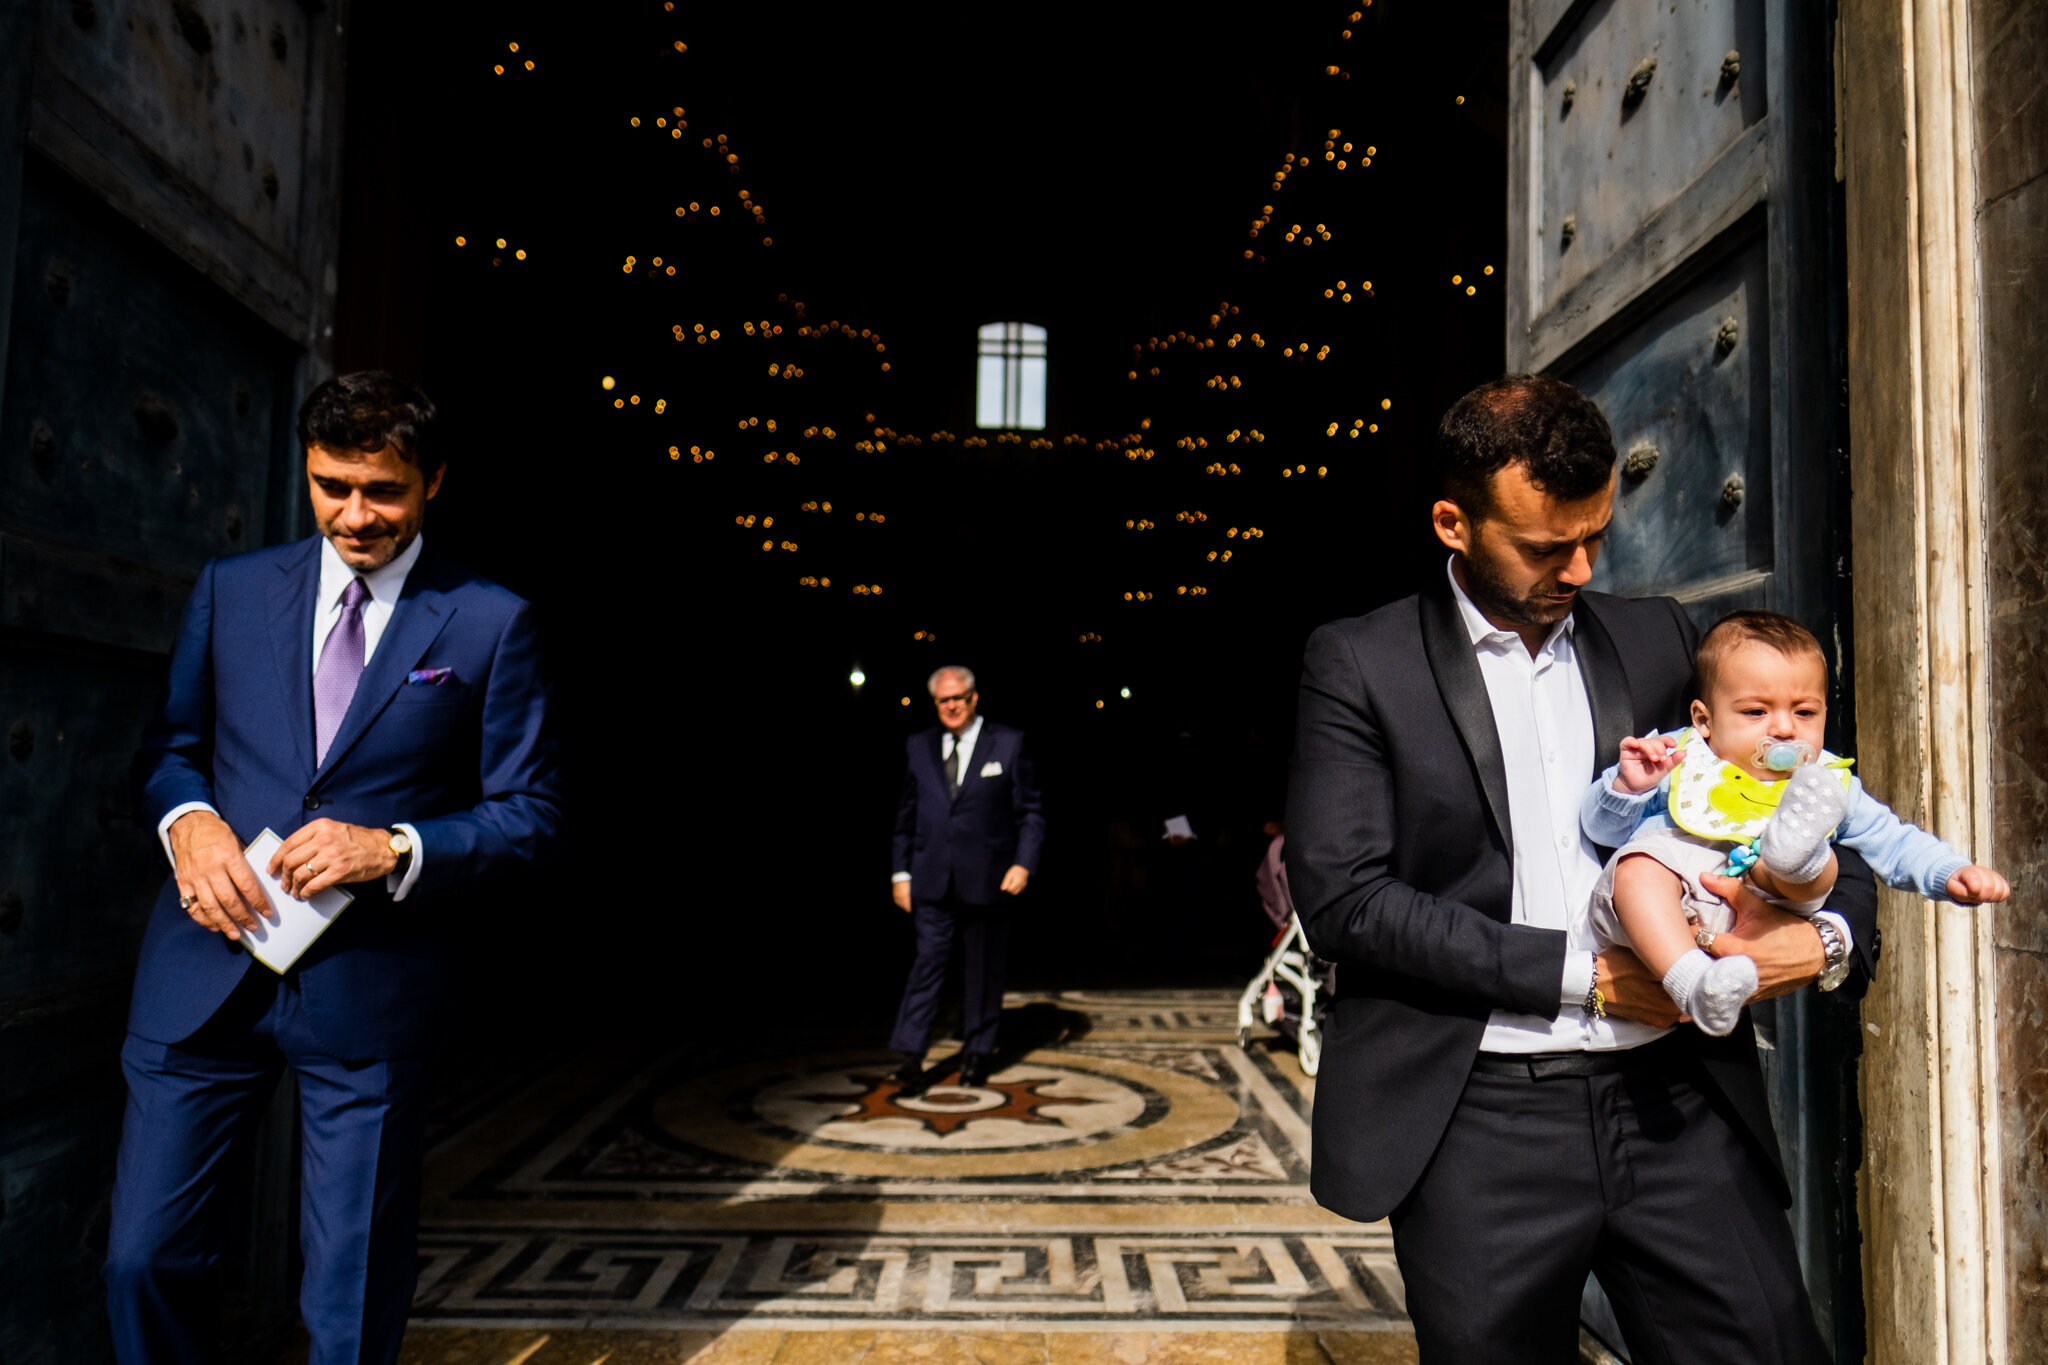 wedding-photography-commendadisancalogero-enkant-15.jpg